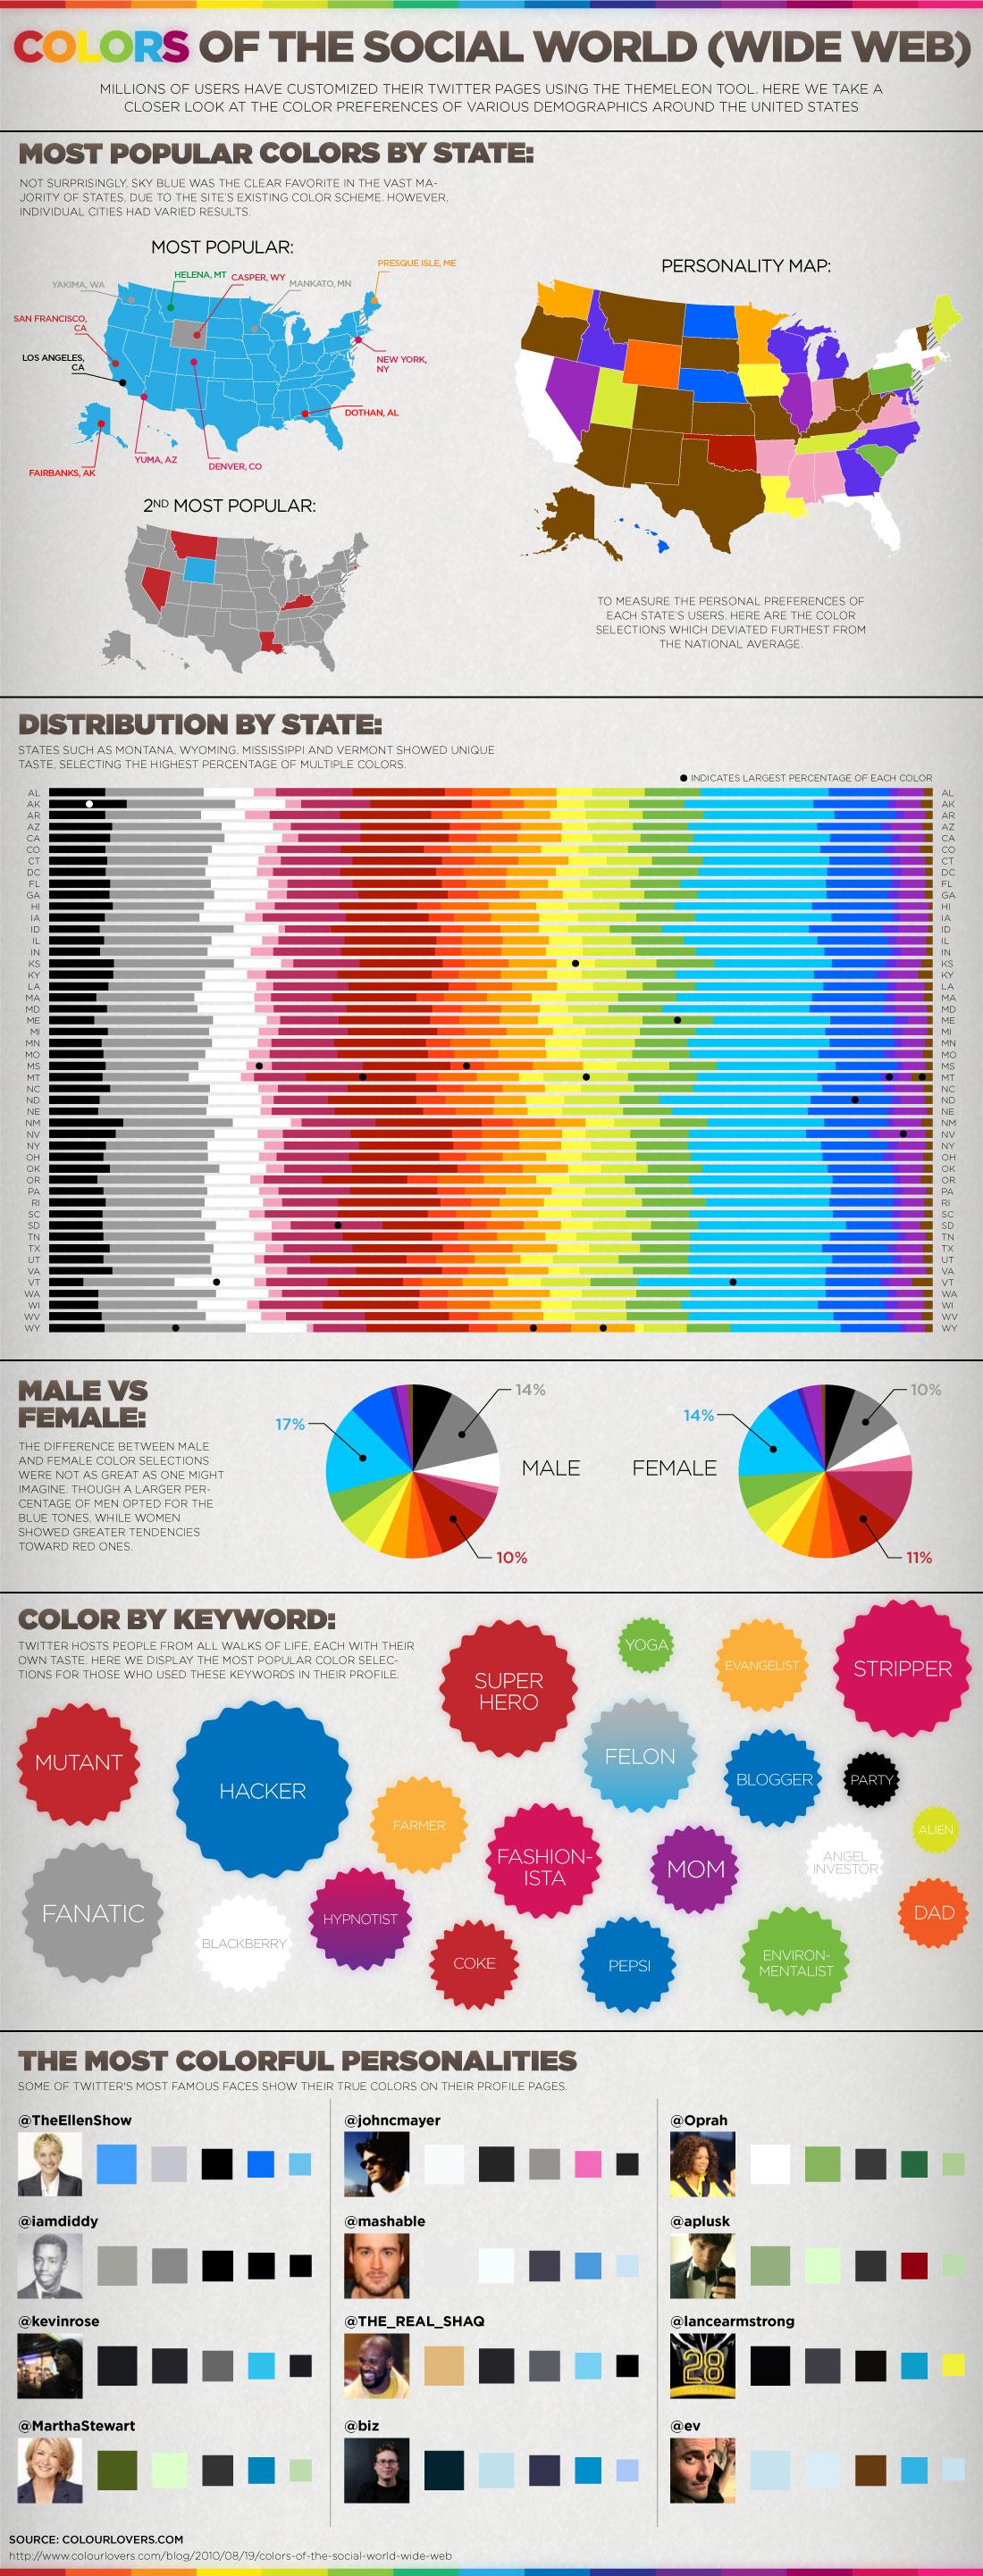 twitter_colors.jpg